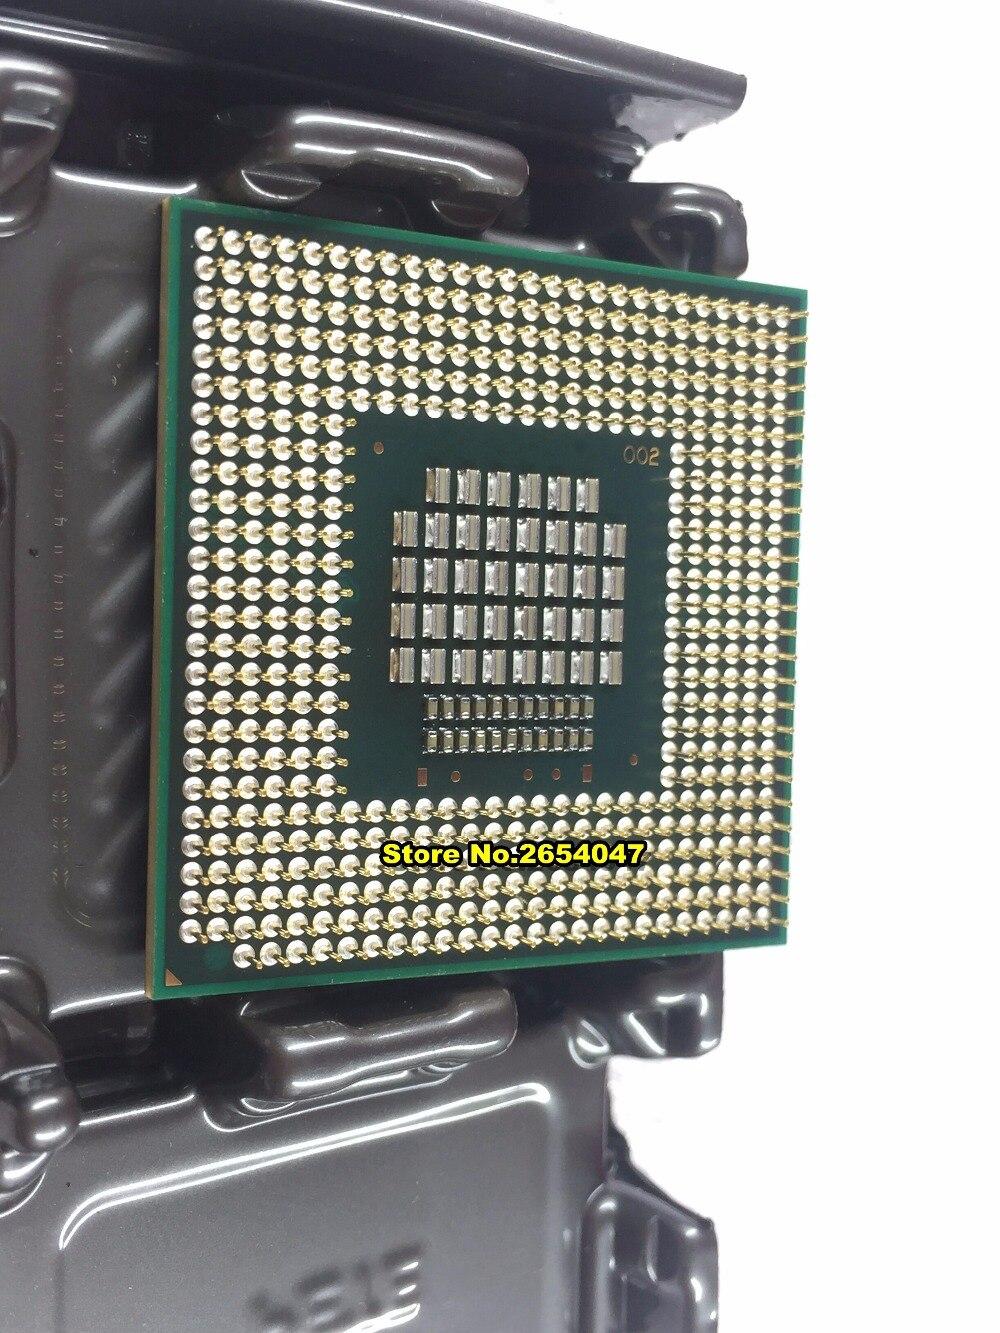 CPU ordinateur portable Core 2 Duo T7200 CPU 4 M Socket 479 (Cache/2.0 GHz/667/Dual-Core) Ordinateur Portabl